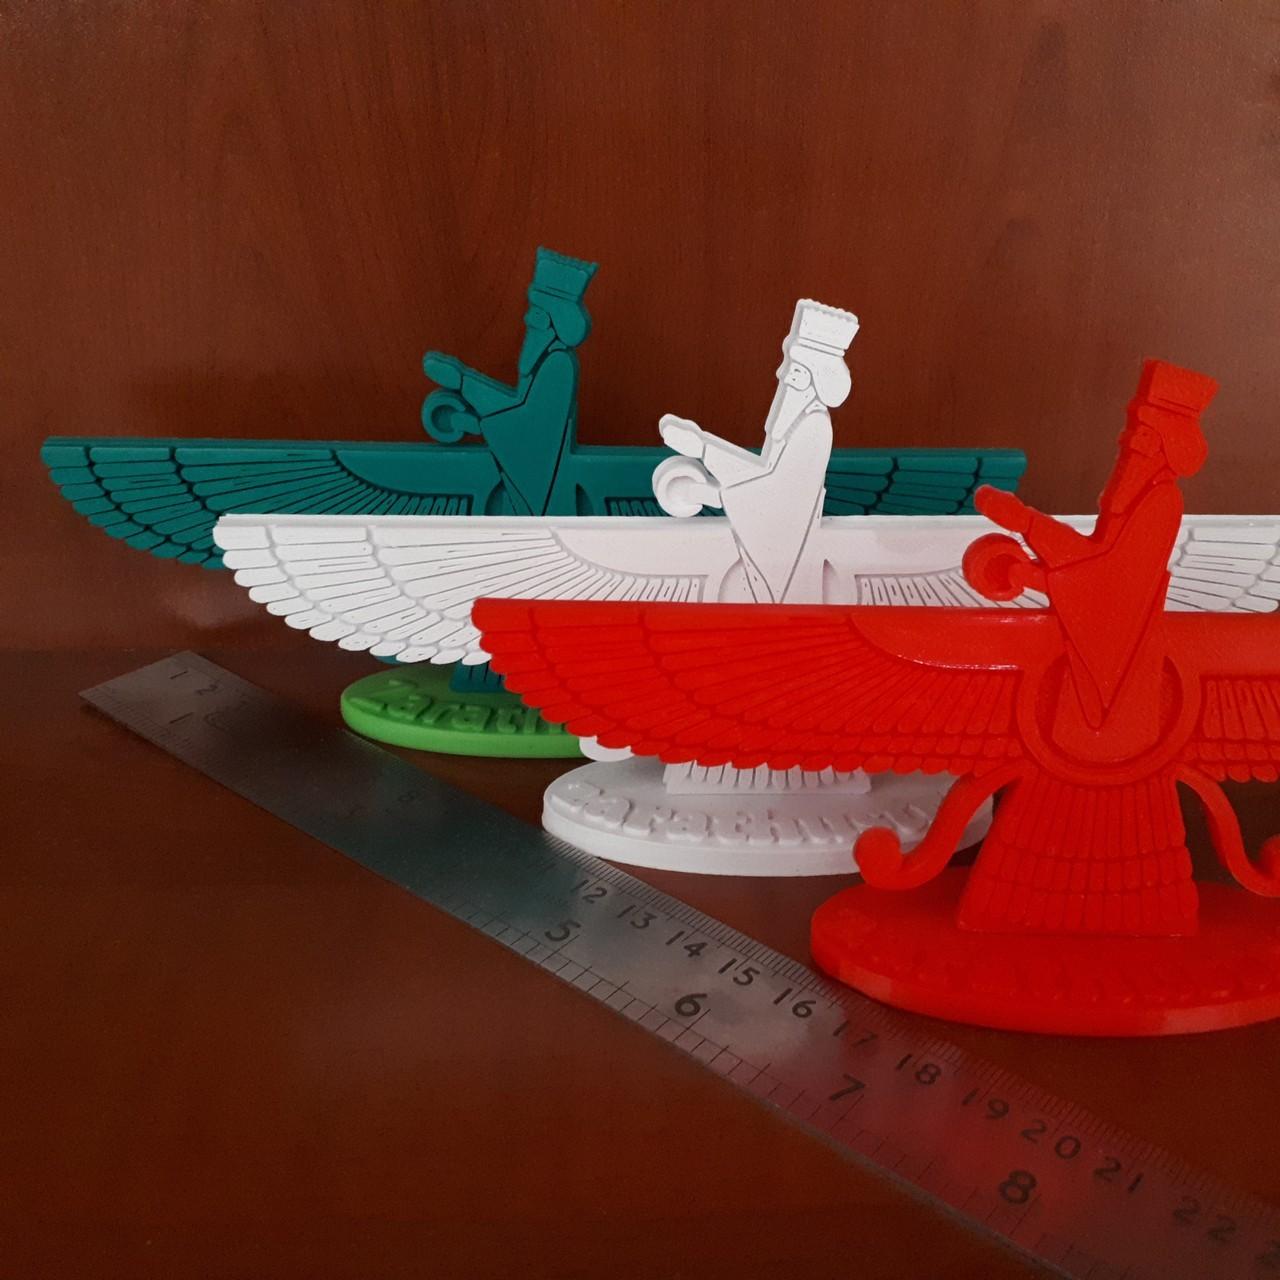 20180301_095553.jpg Download STL file Faravahar • 3D printable design, iradj3d